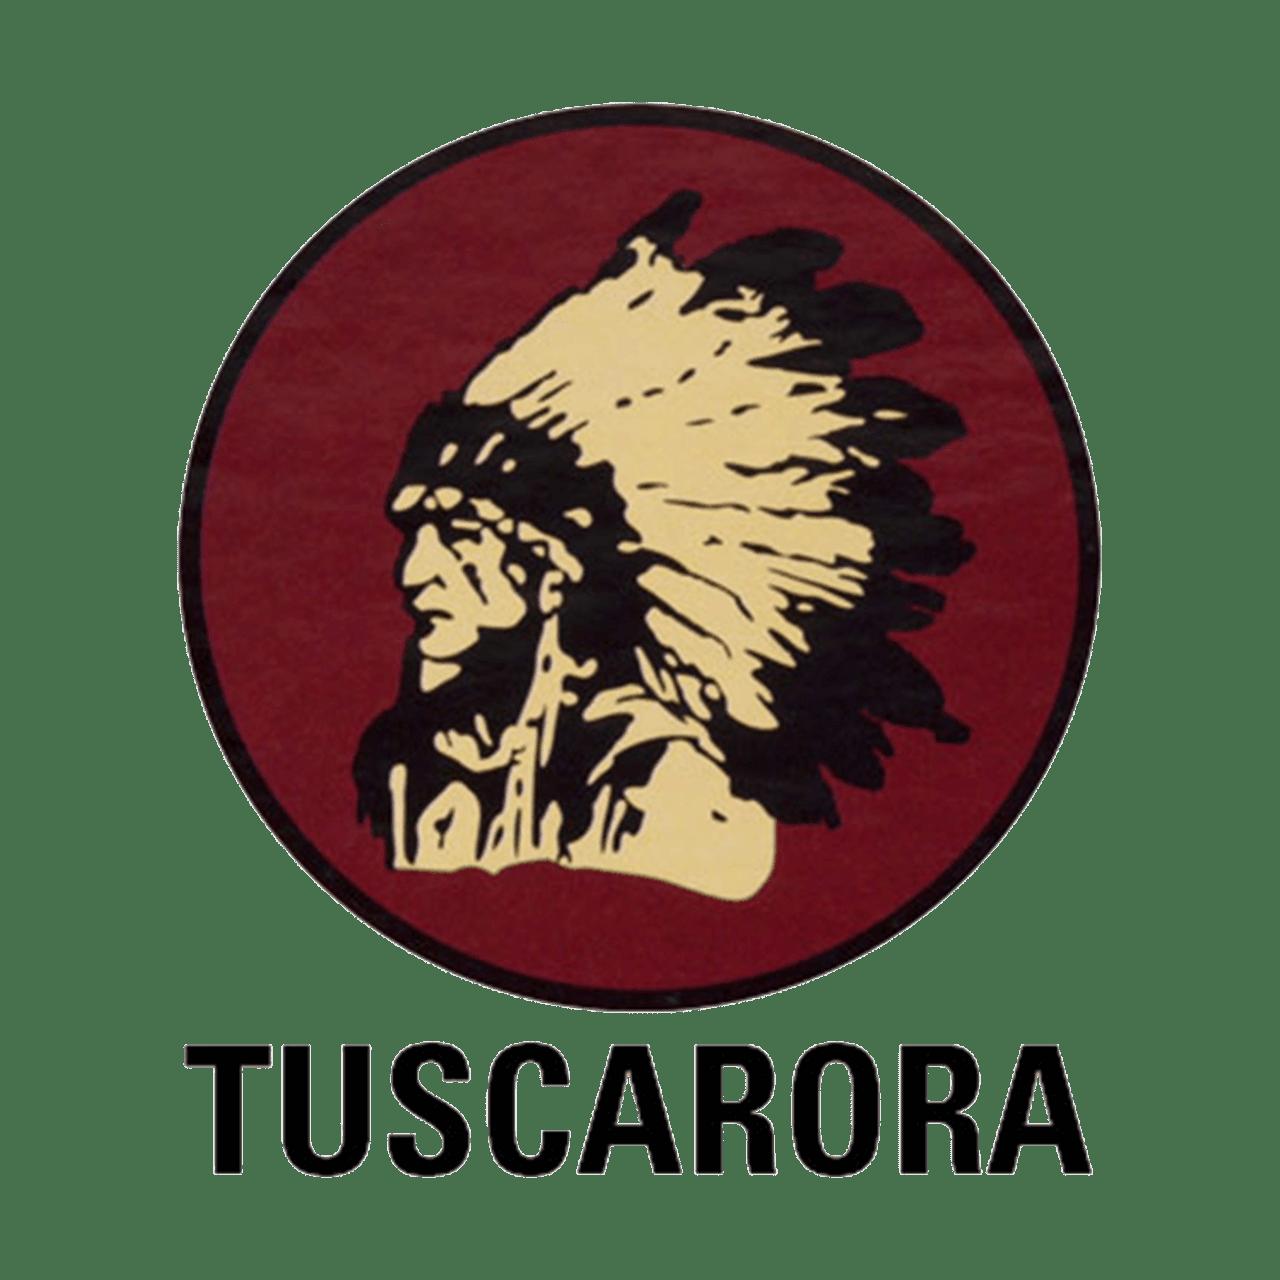 Tuscarora Breva Cigars - 5.5 x 48 (Box of 50)